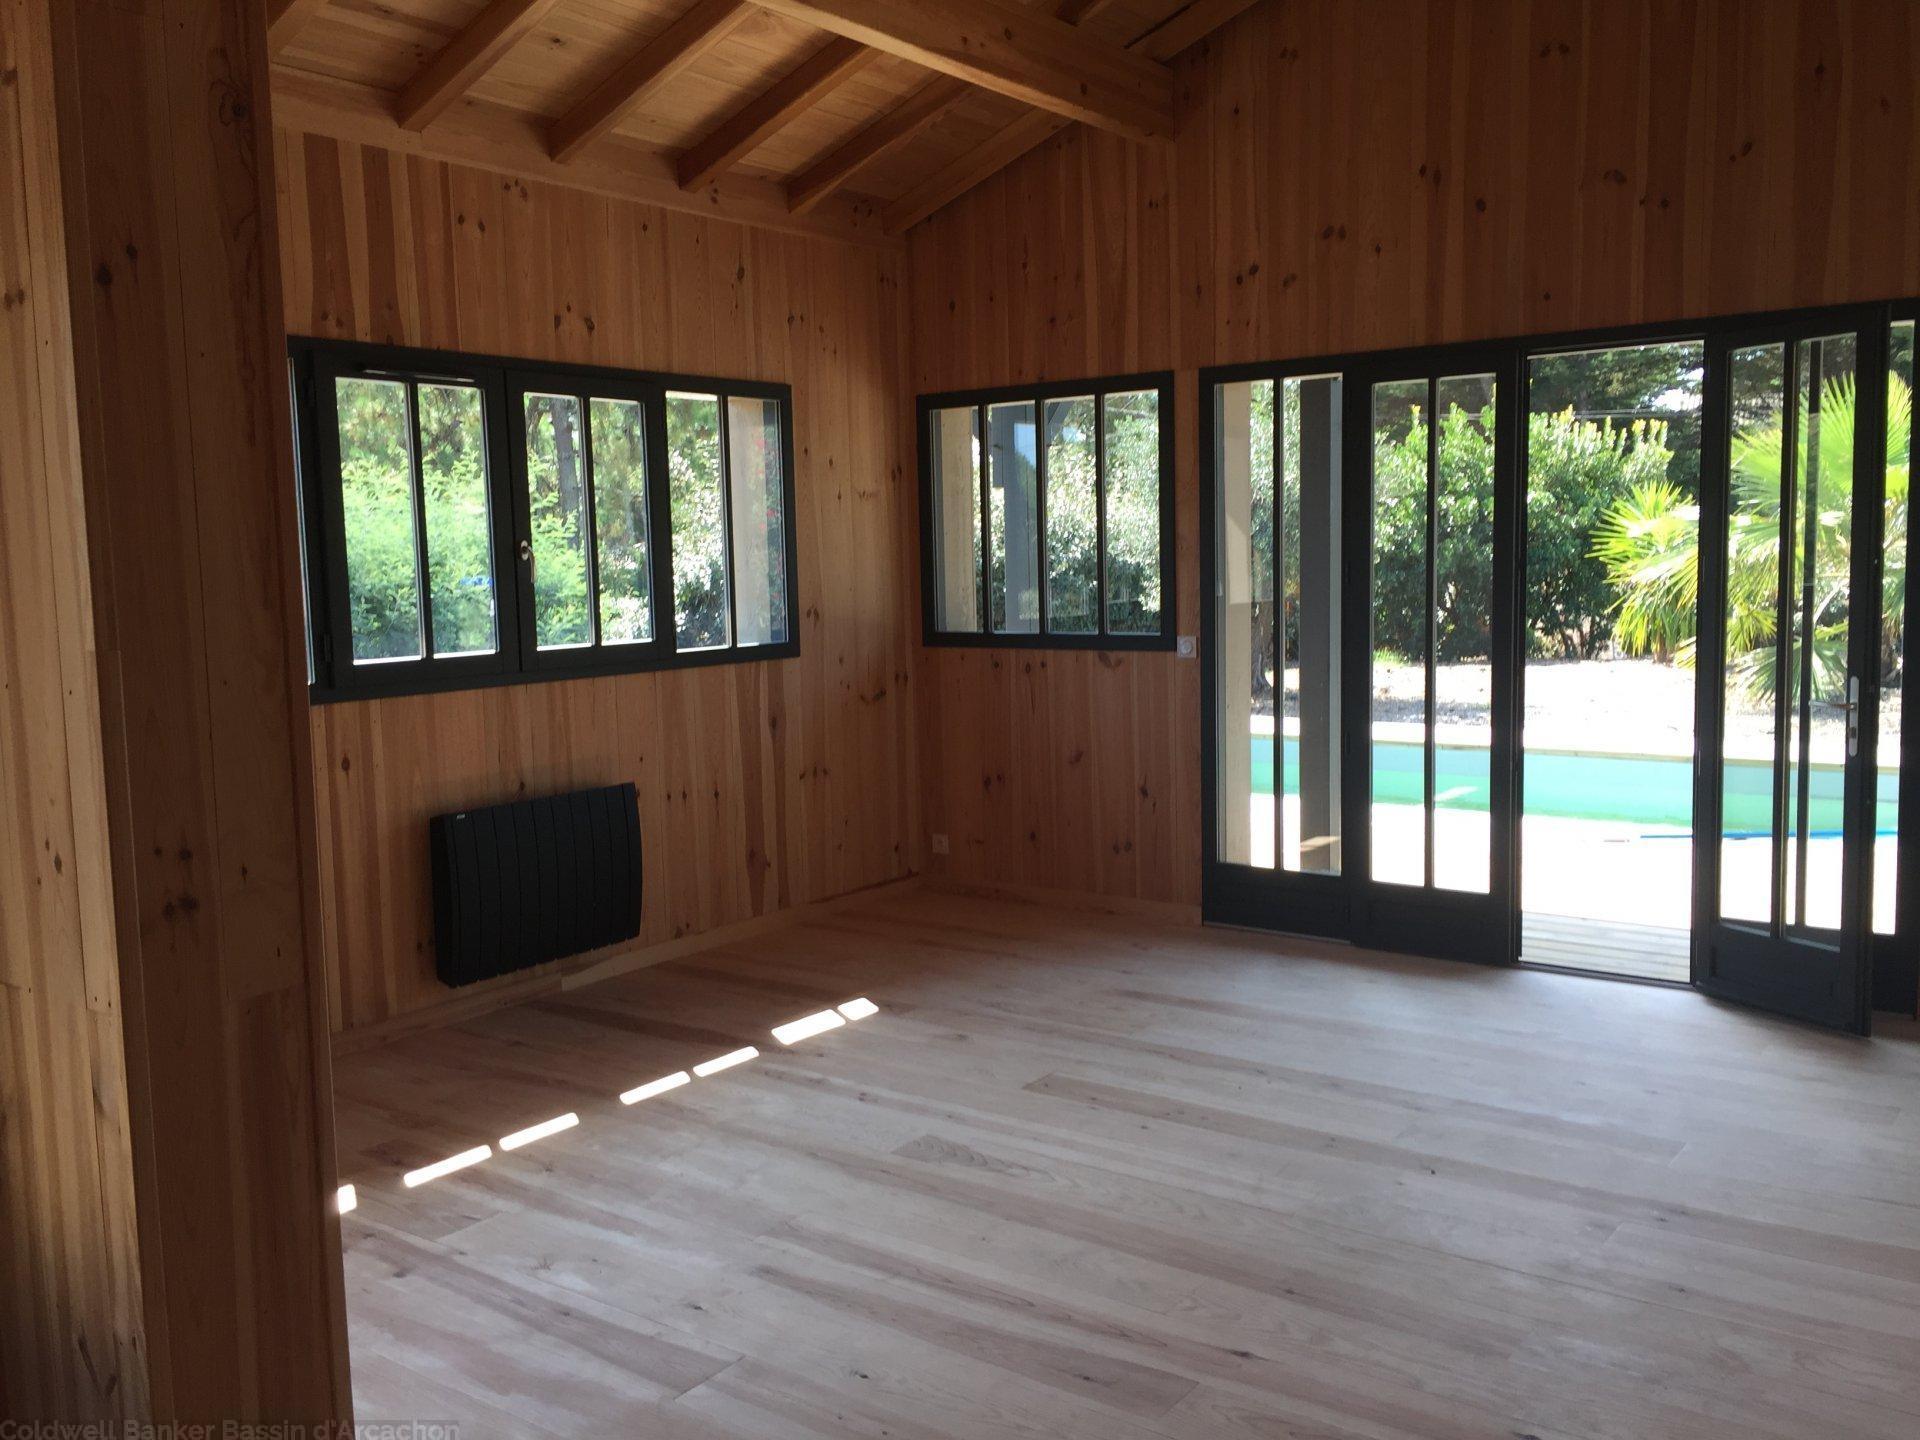 Villa neuve a vendre au cap ferret proche océan